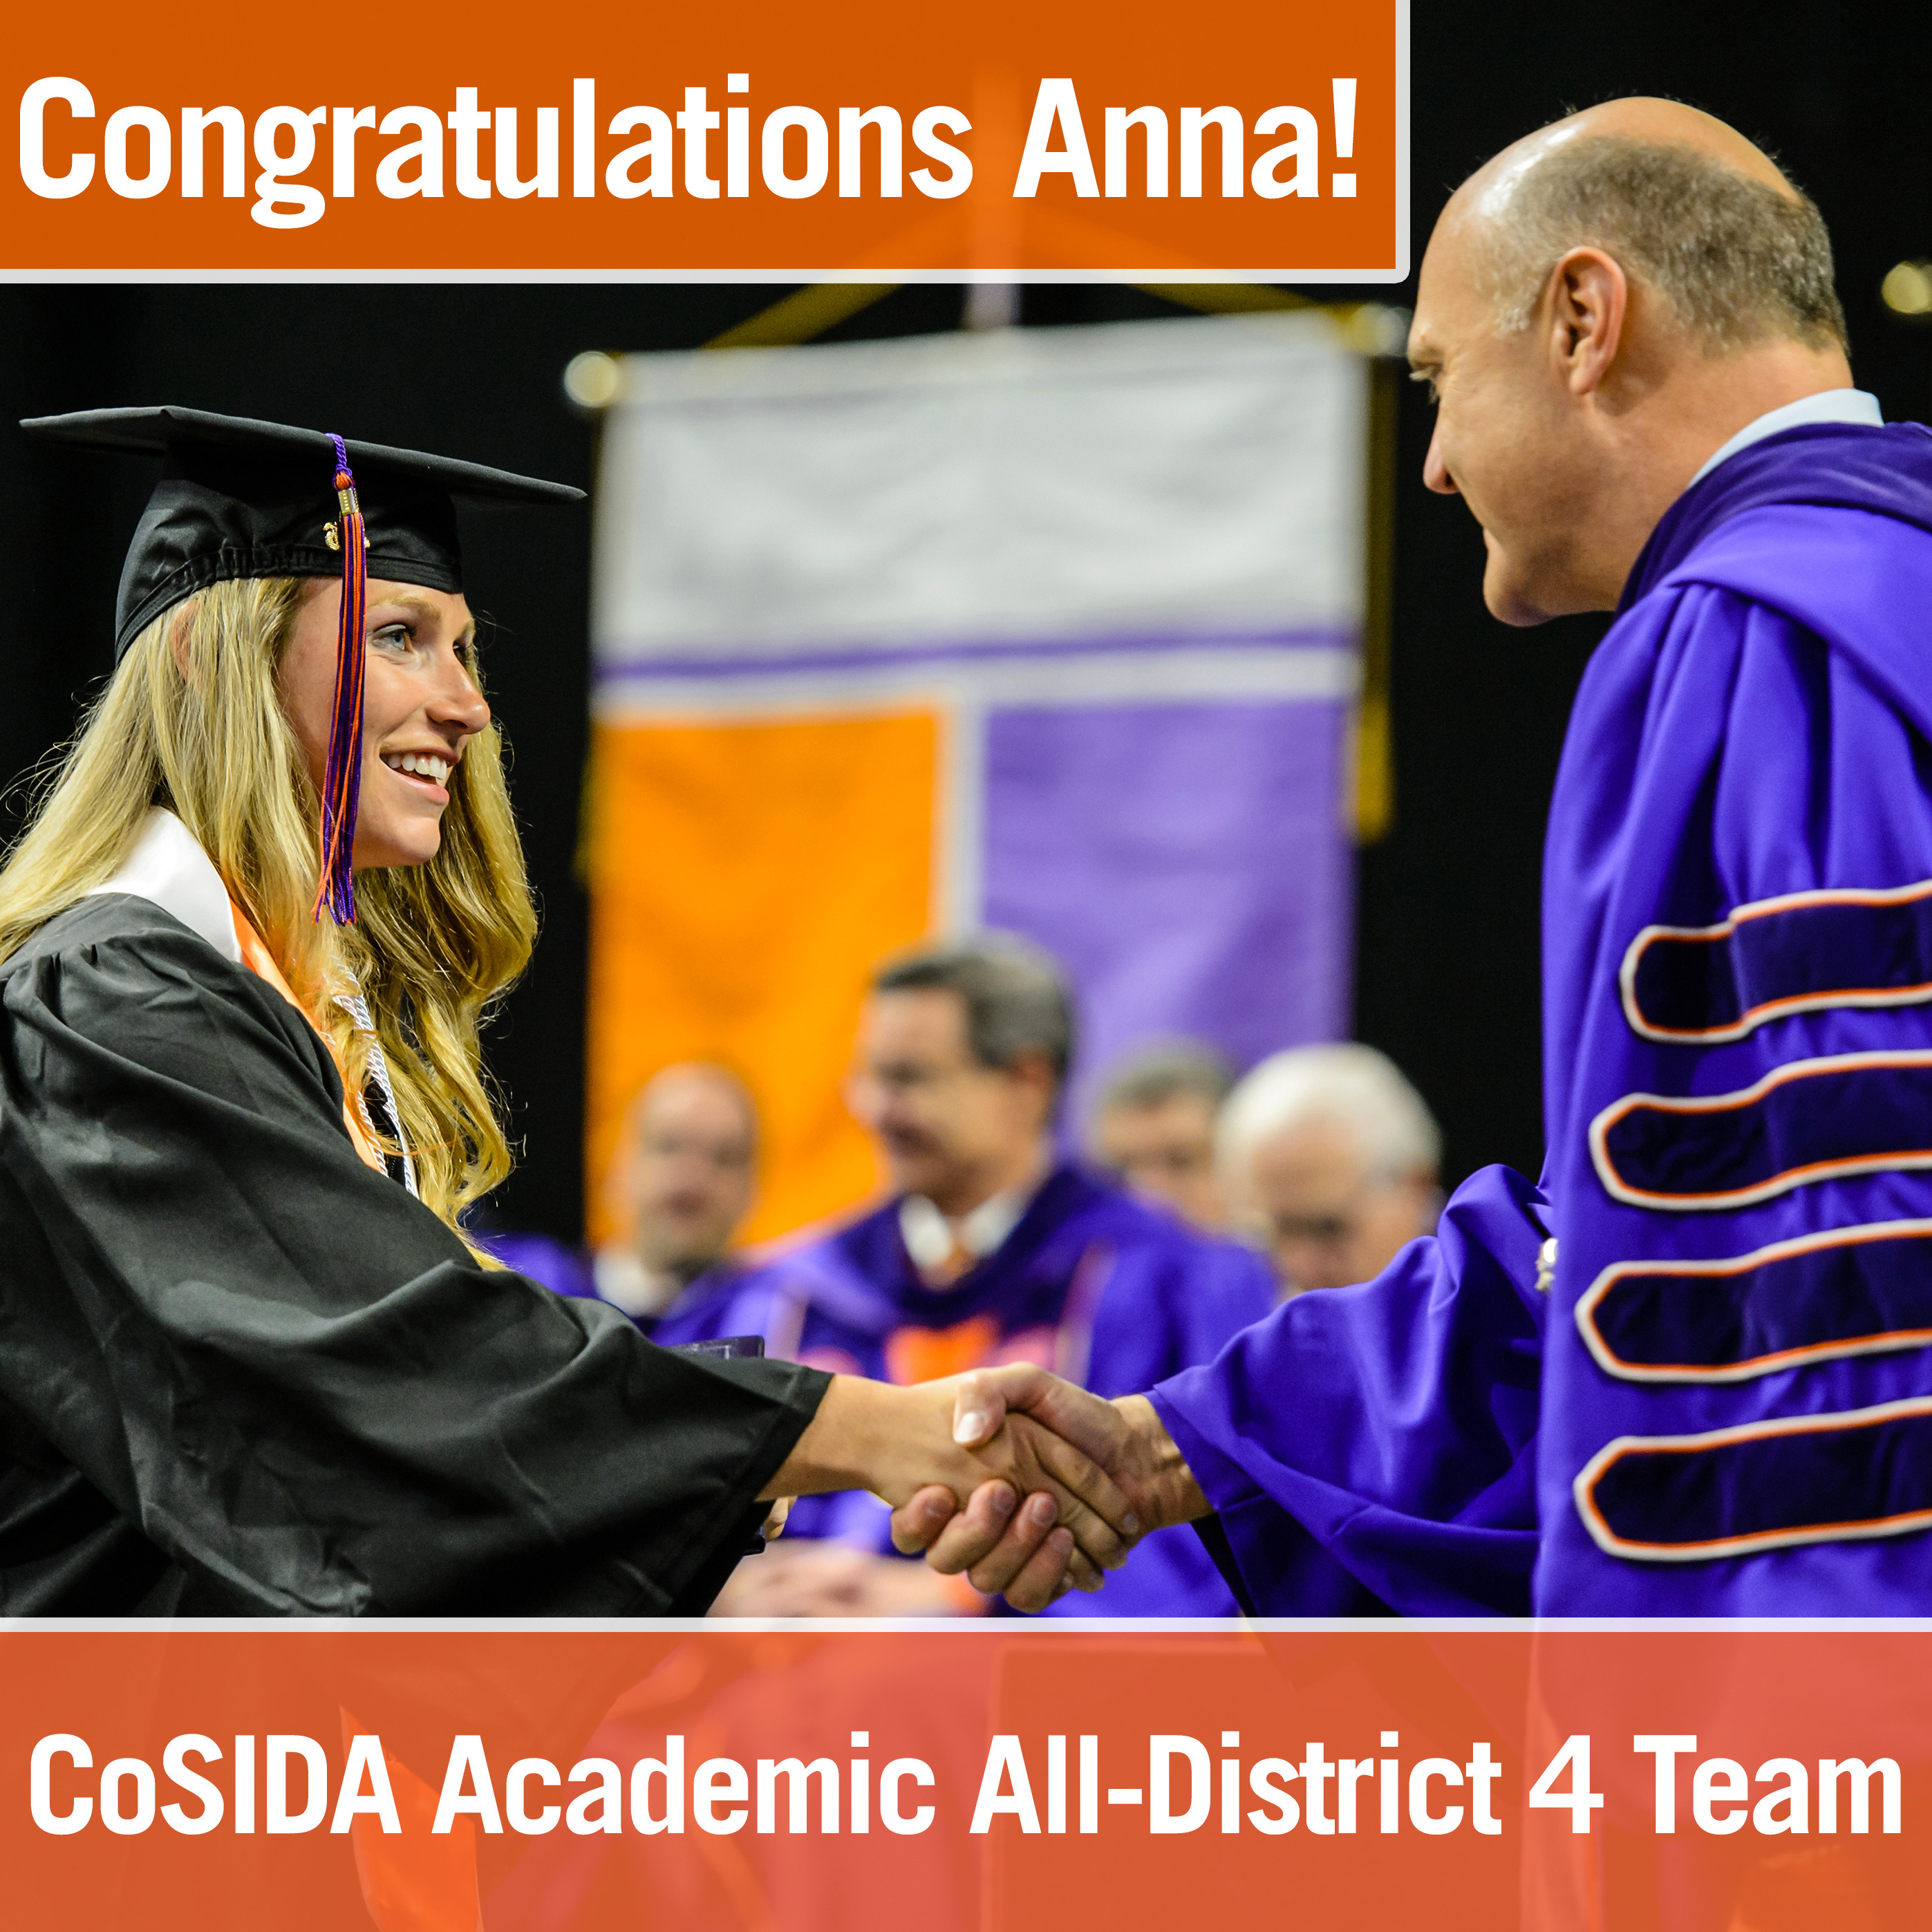 Skochdopole named to CoSIDA All-District Team